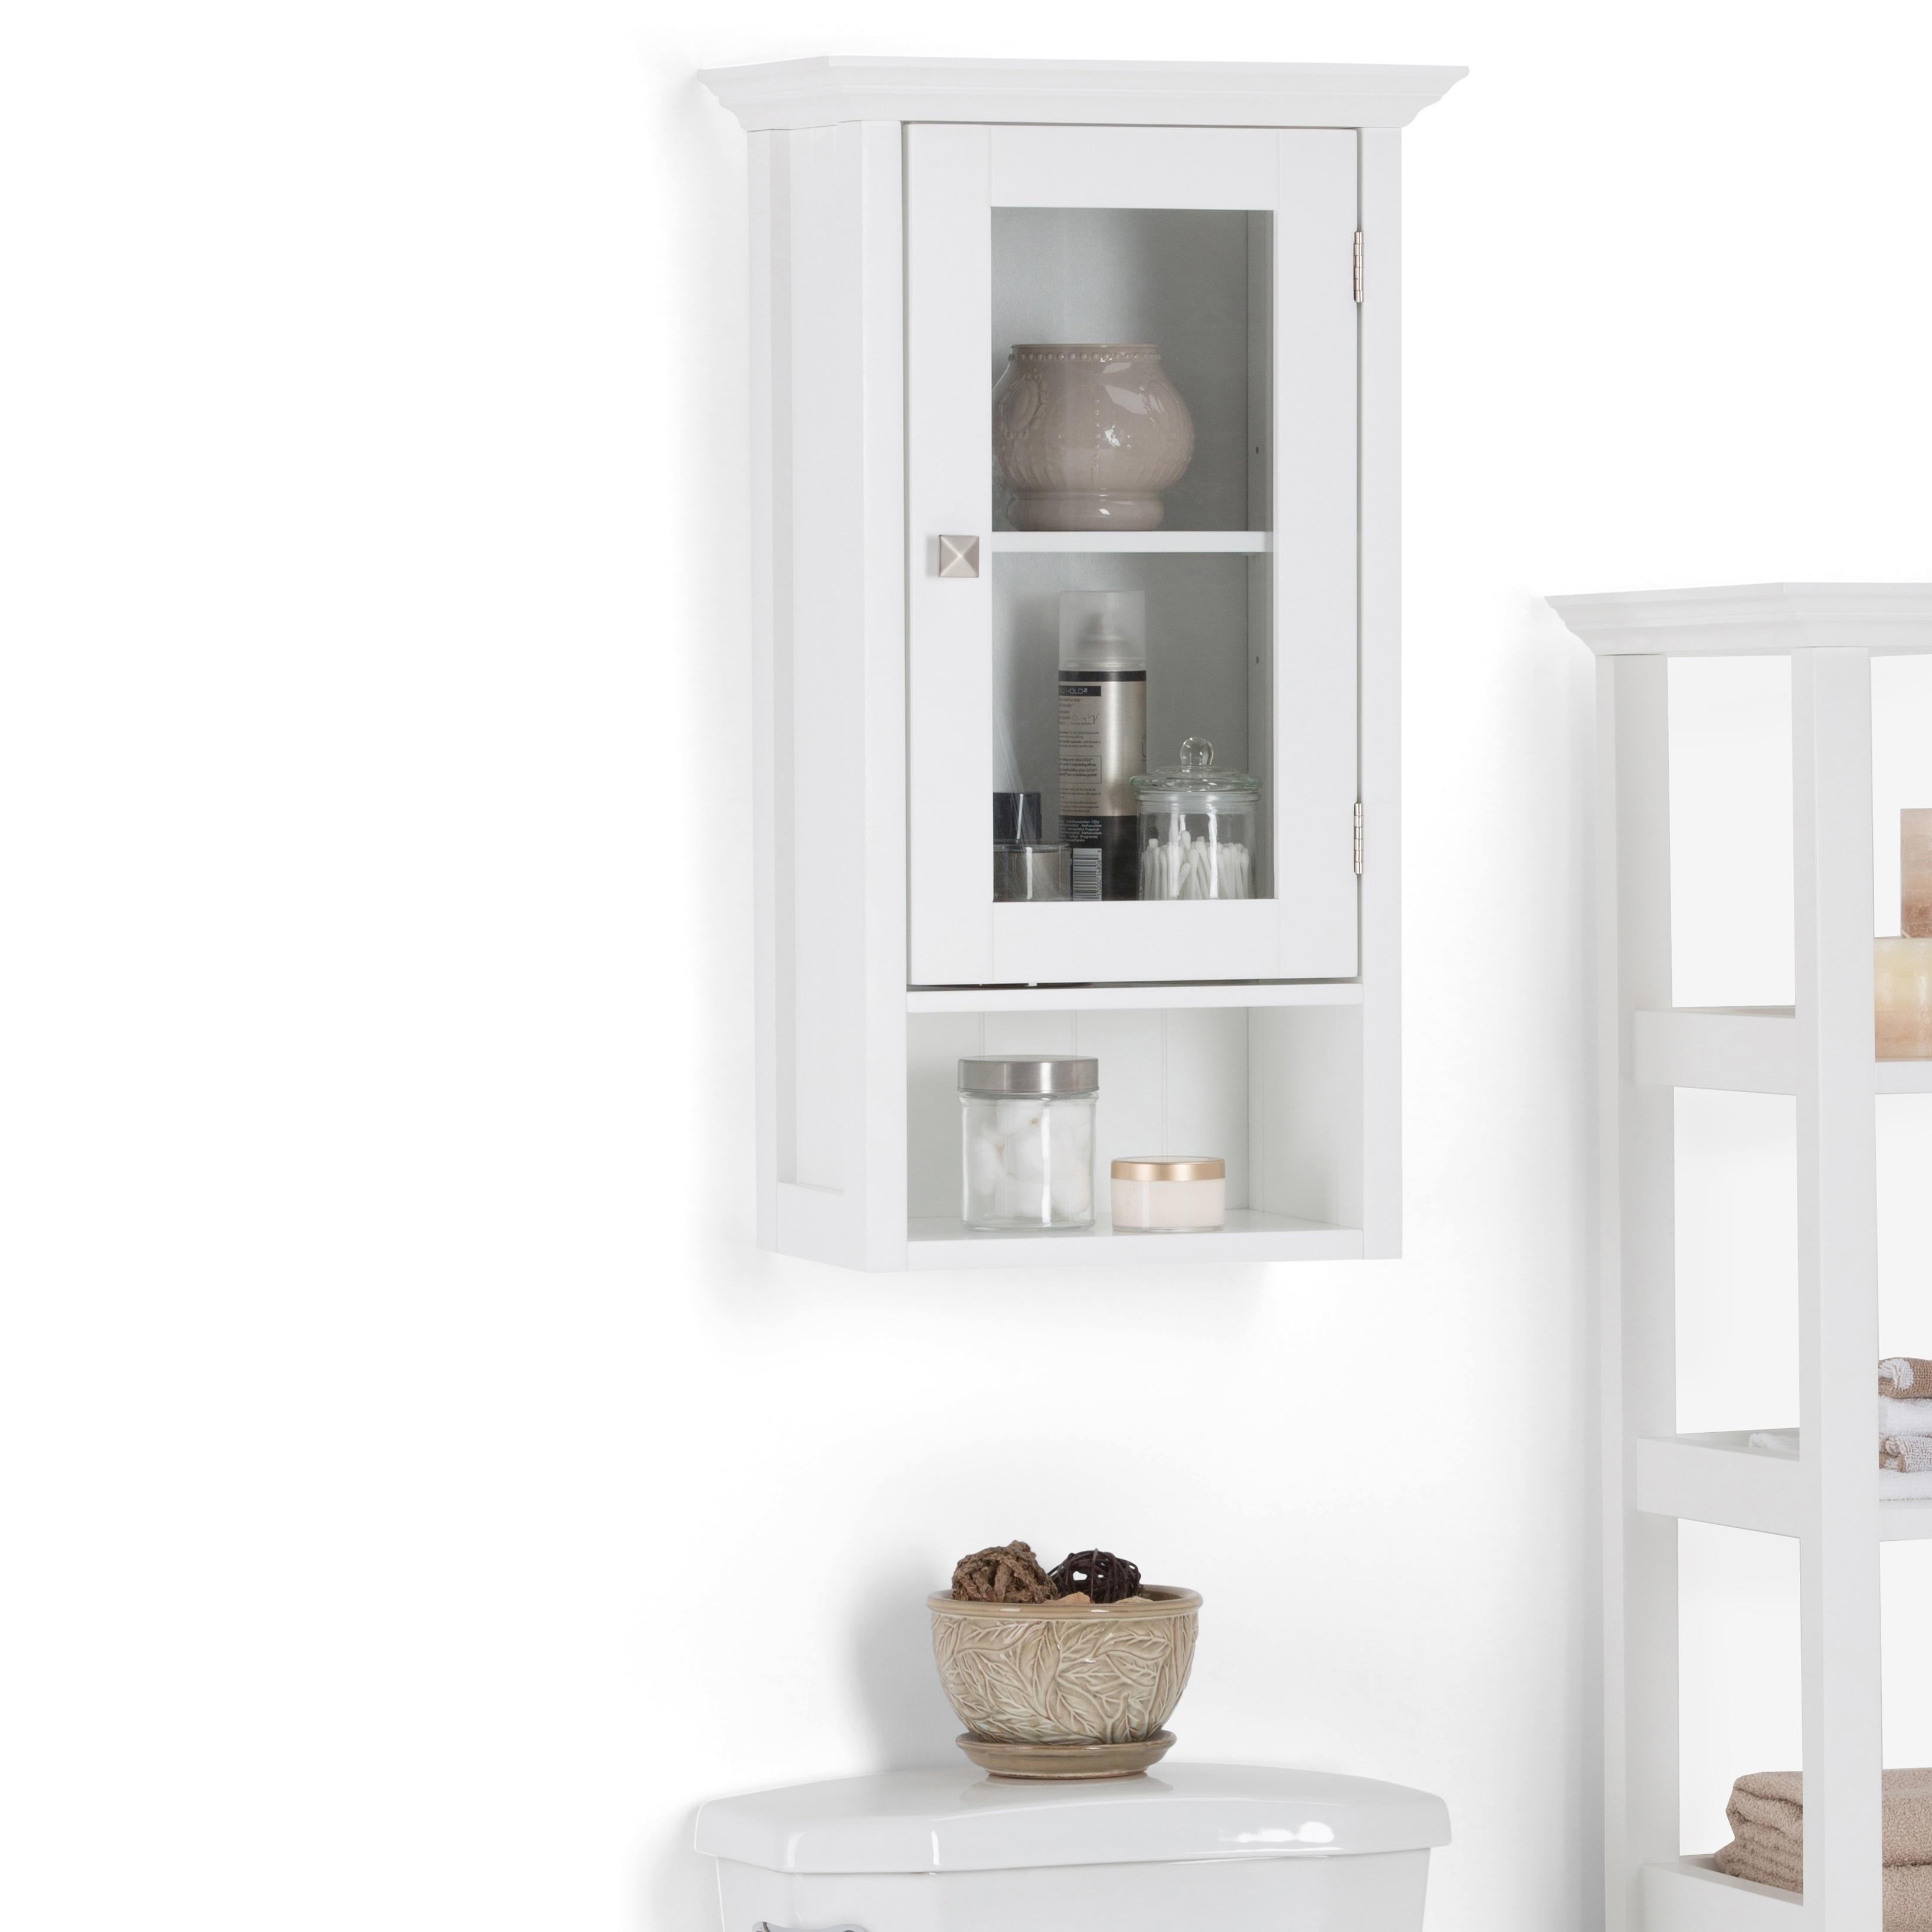 Wyndenhall Normandy 28 Inch H X 15 75 W Single Door Wall Bath Cabinet In White